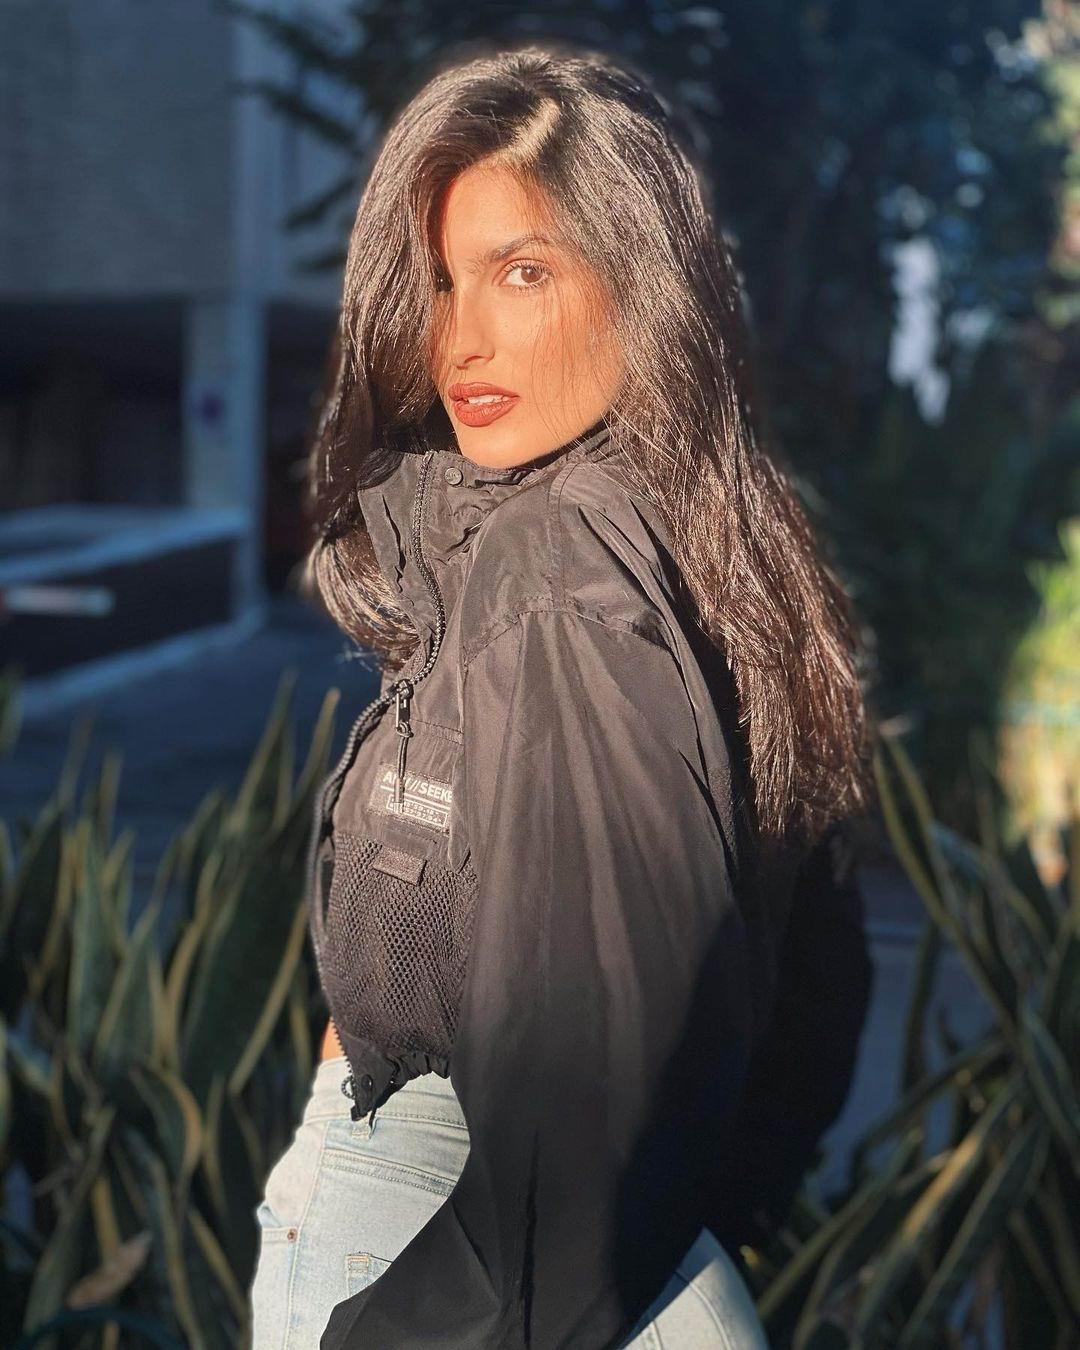 Model Barbara